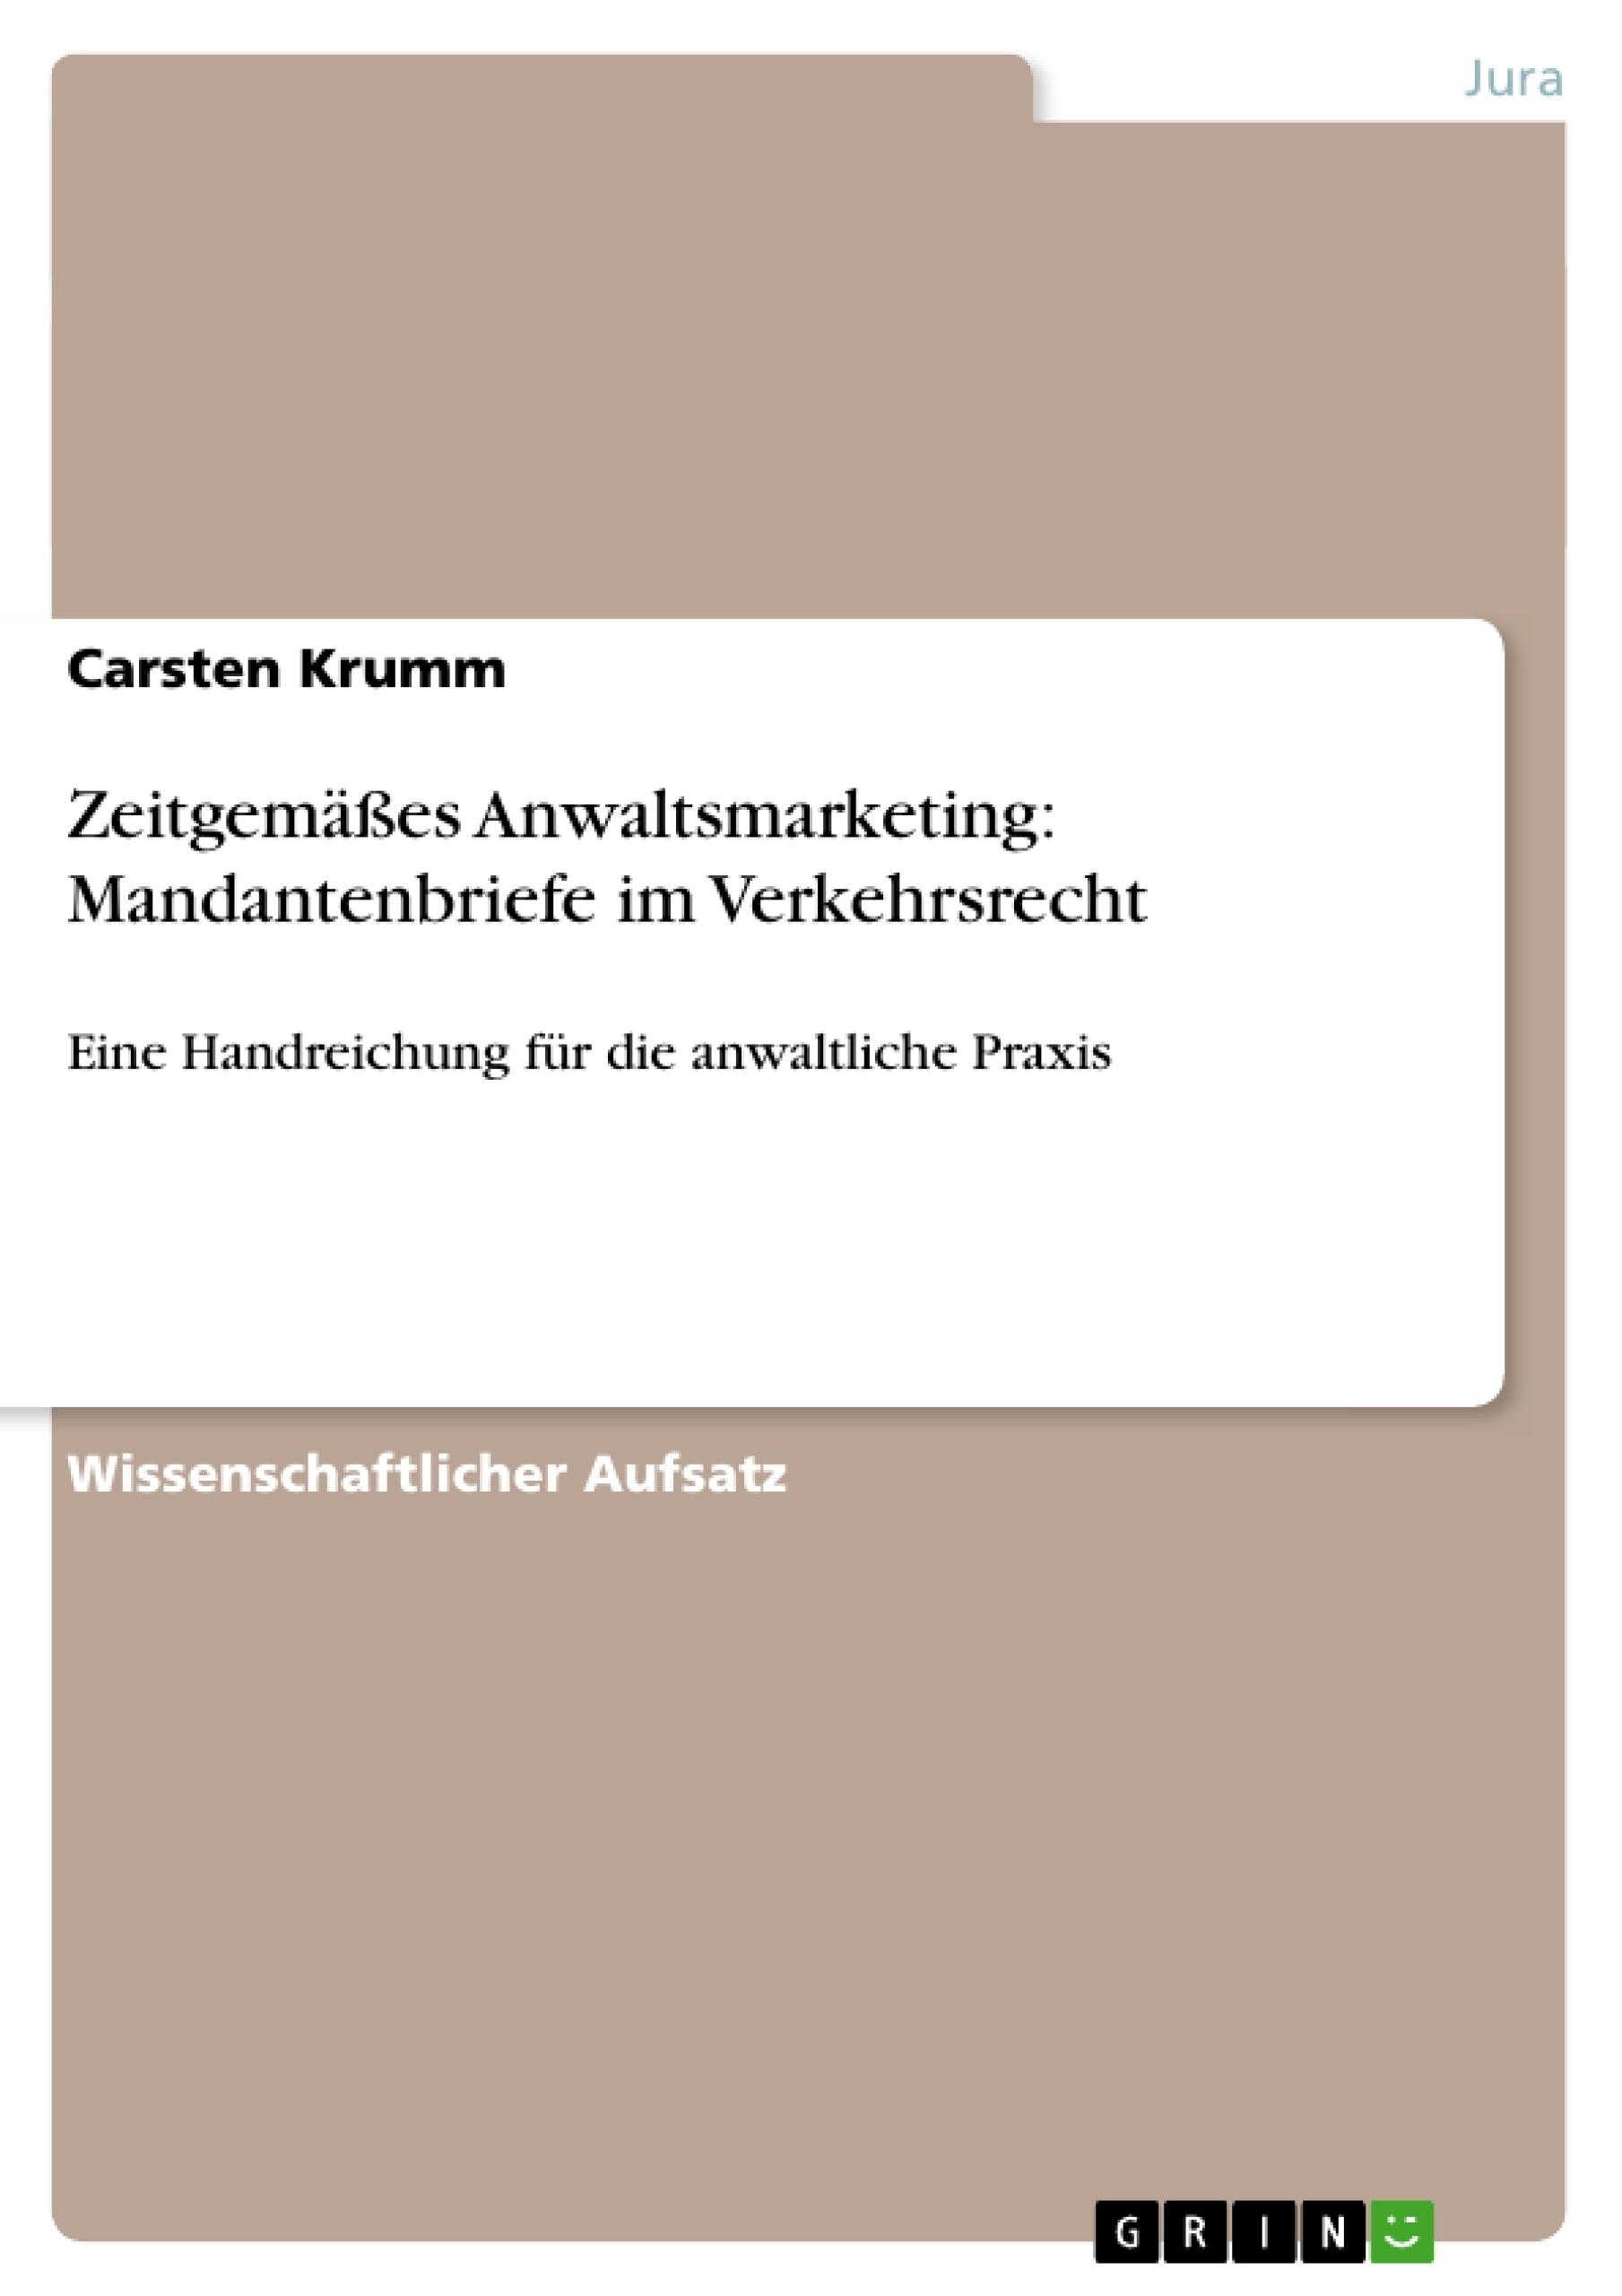 Titel: Zeitgemäßes Anwaltsmarketing:  Mandantenbriefe im Verkehrsrecht